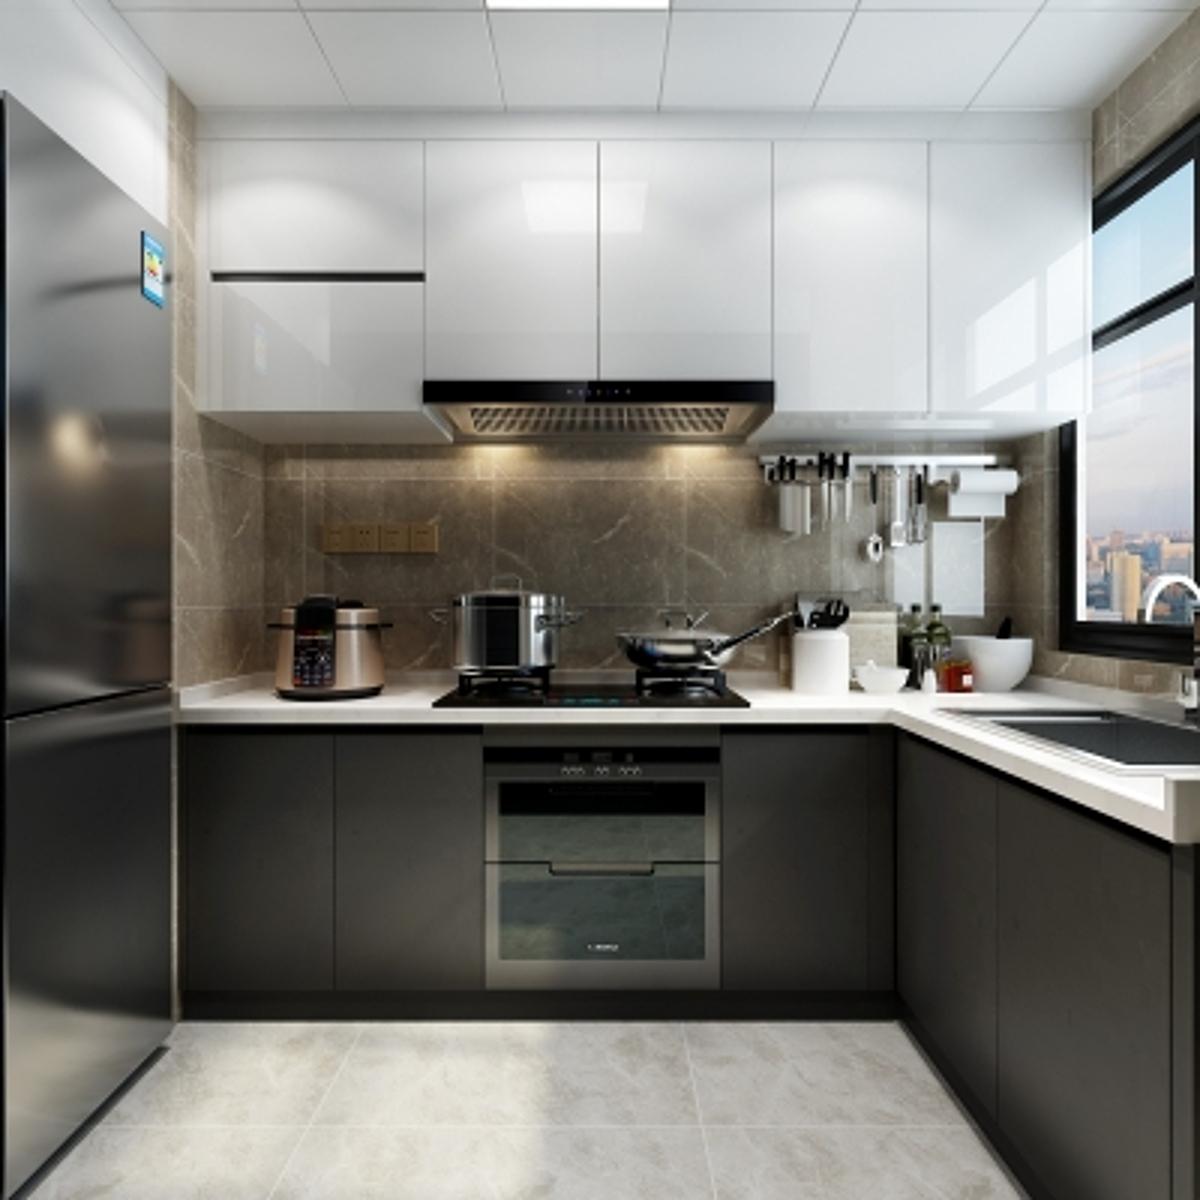 cg250现代厨房橱柜模型